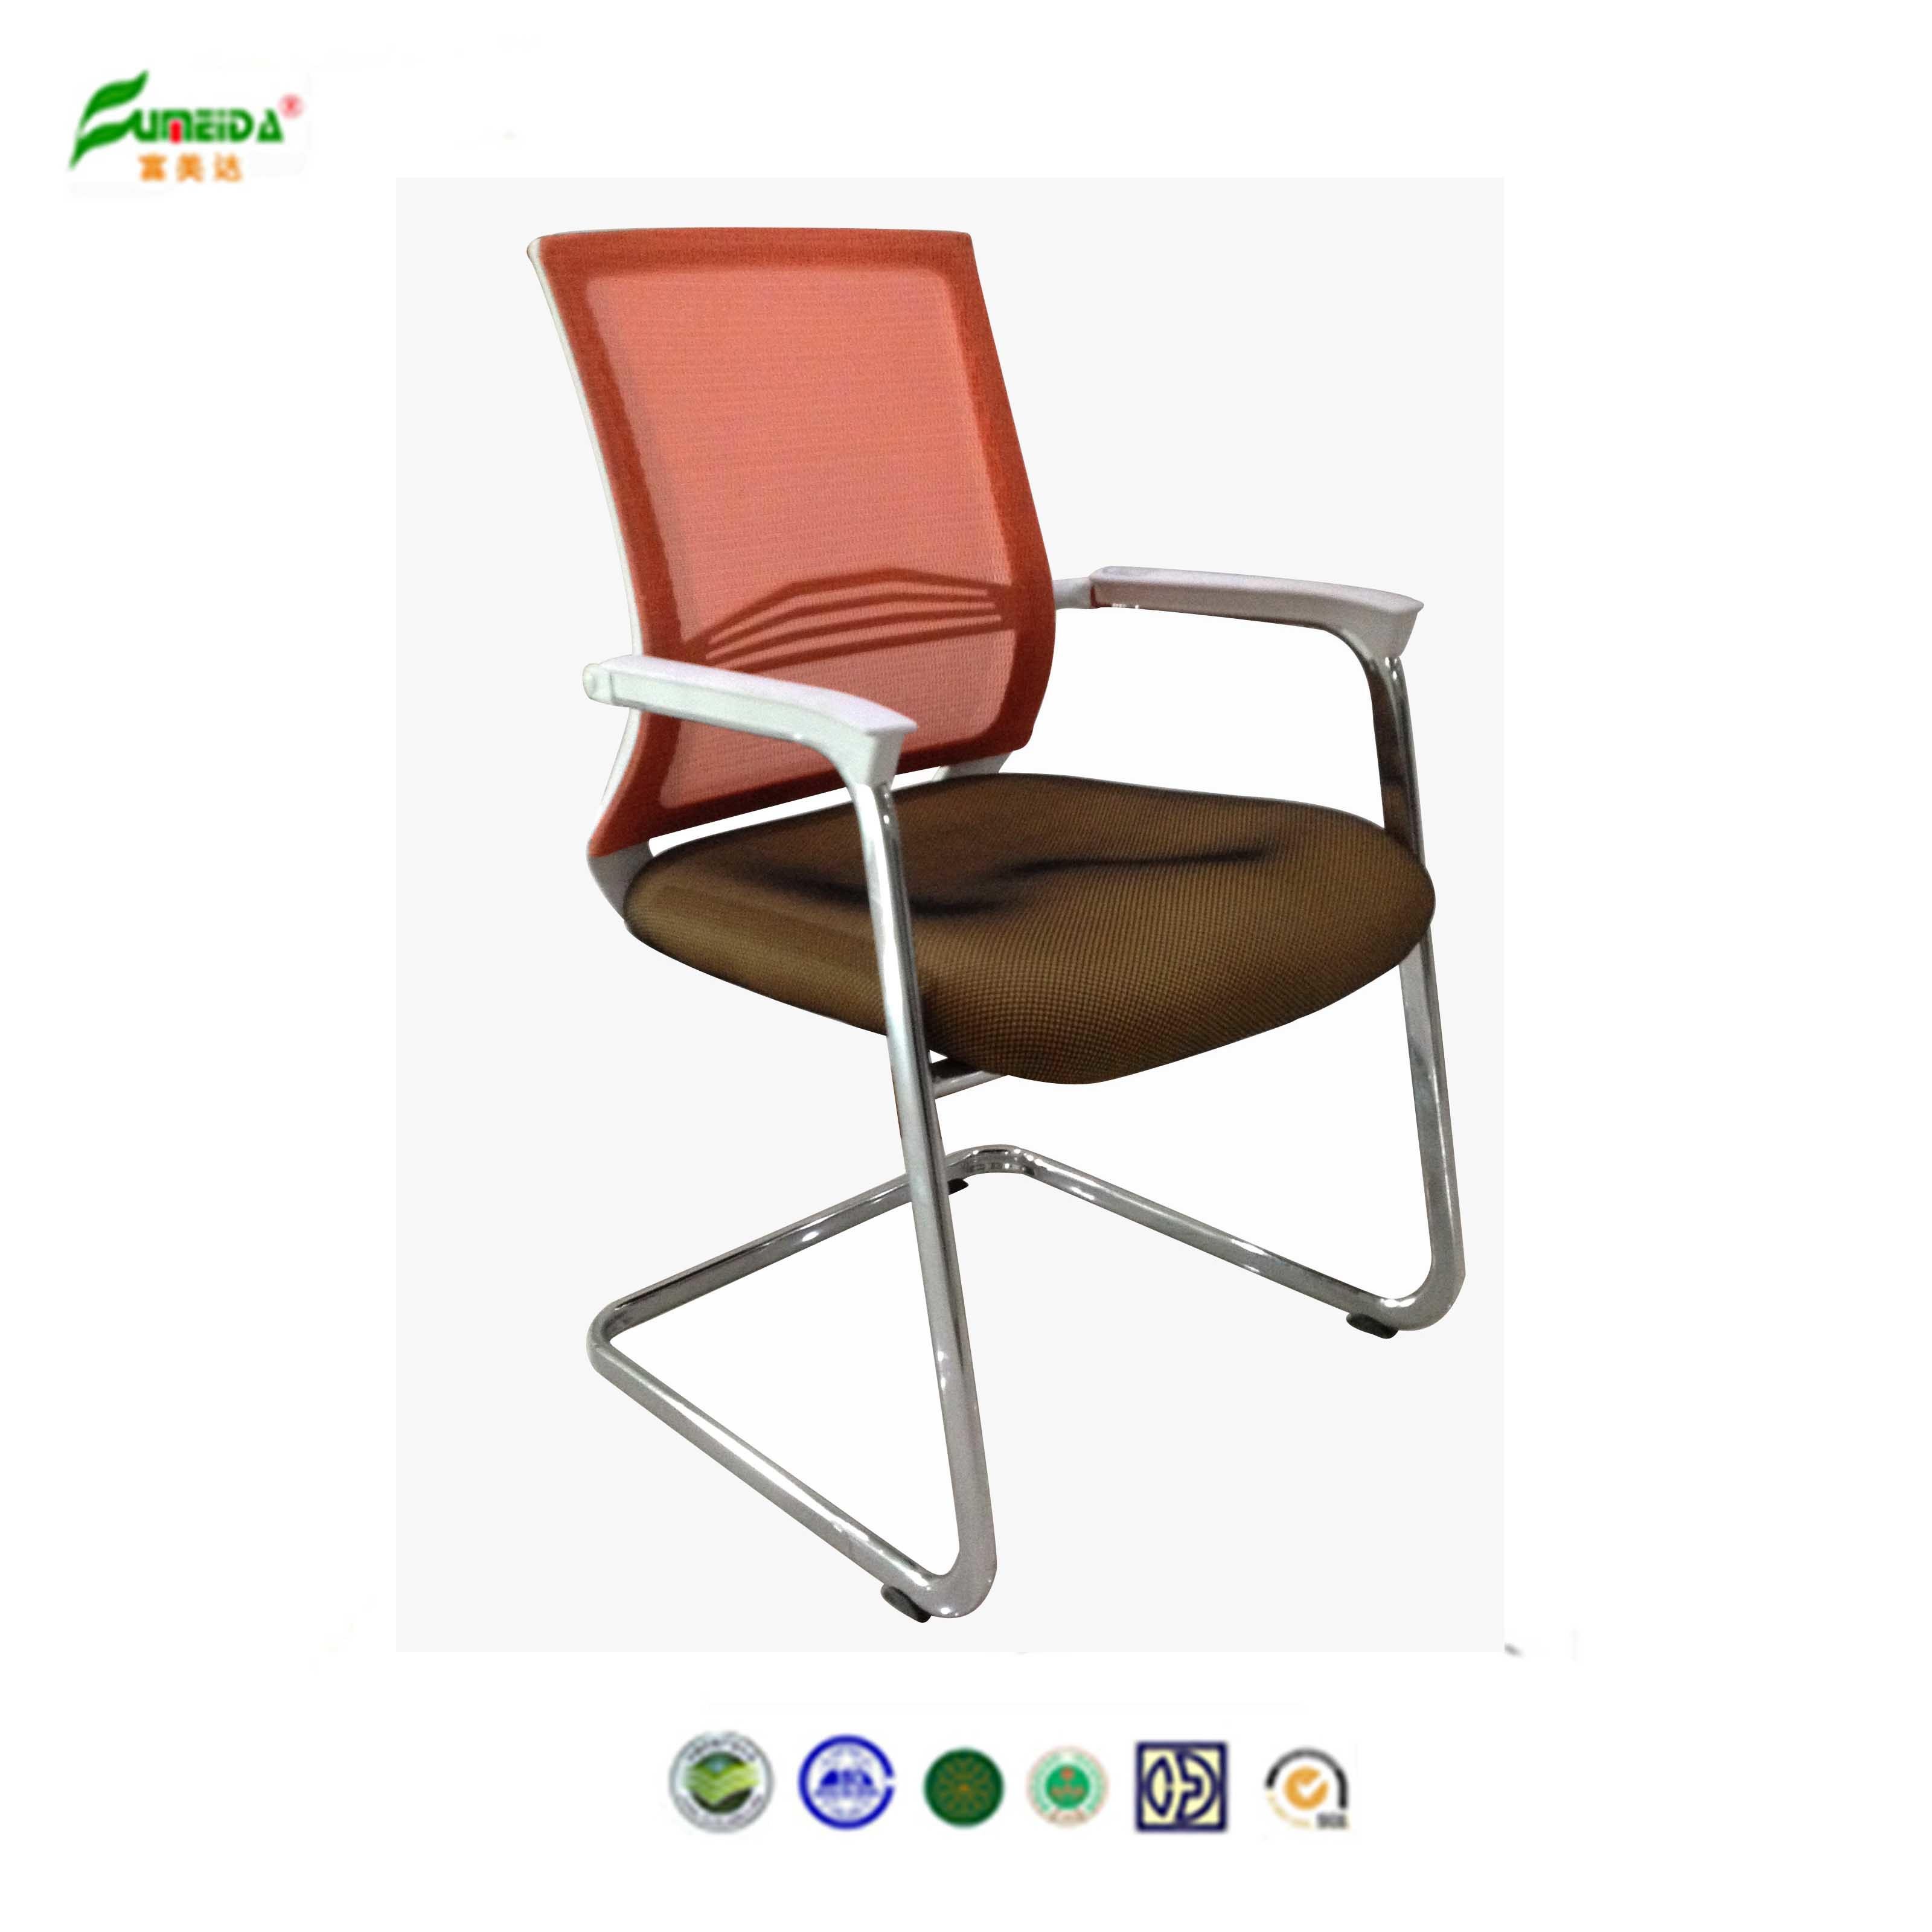 2015 Staff Chair, Ergonomic Mesh Chair Office Furniture